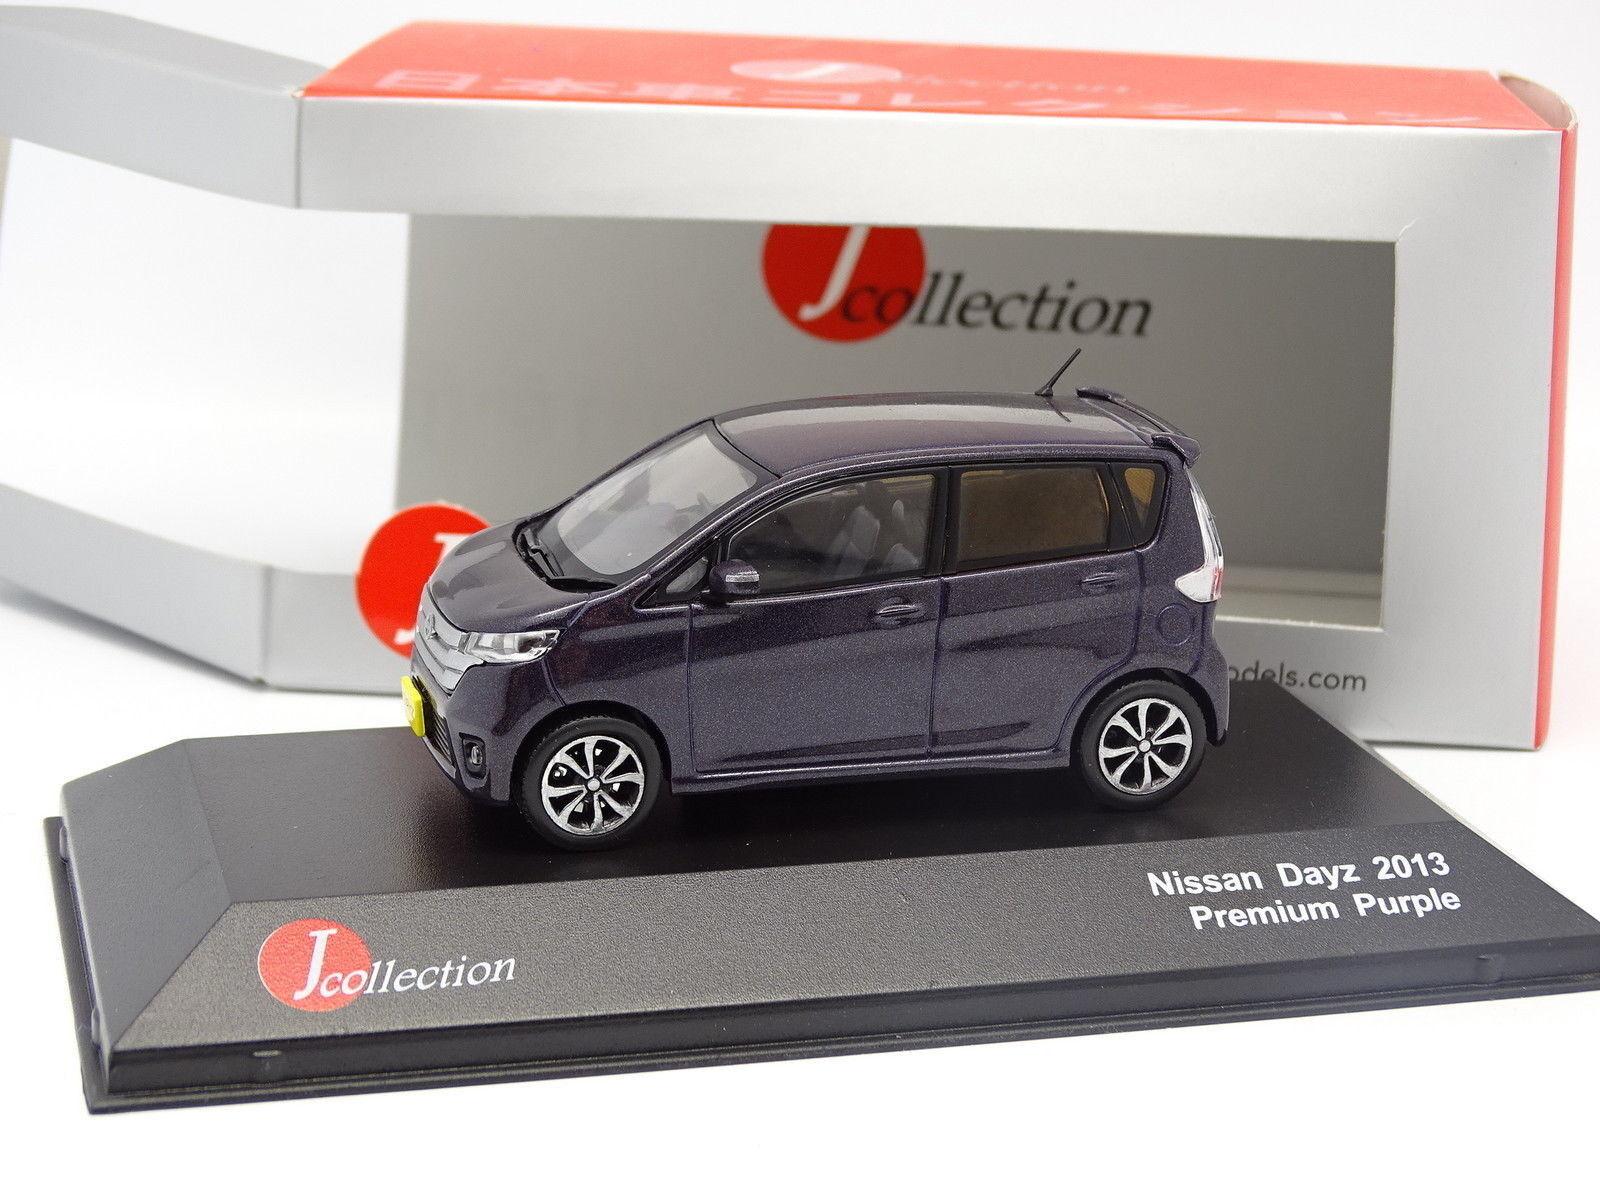 J Collection 1 43 - Nissan Dayz 2013 Morado